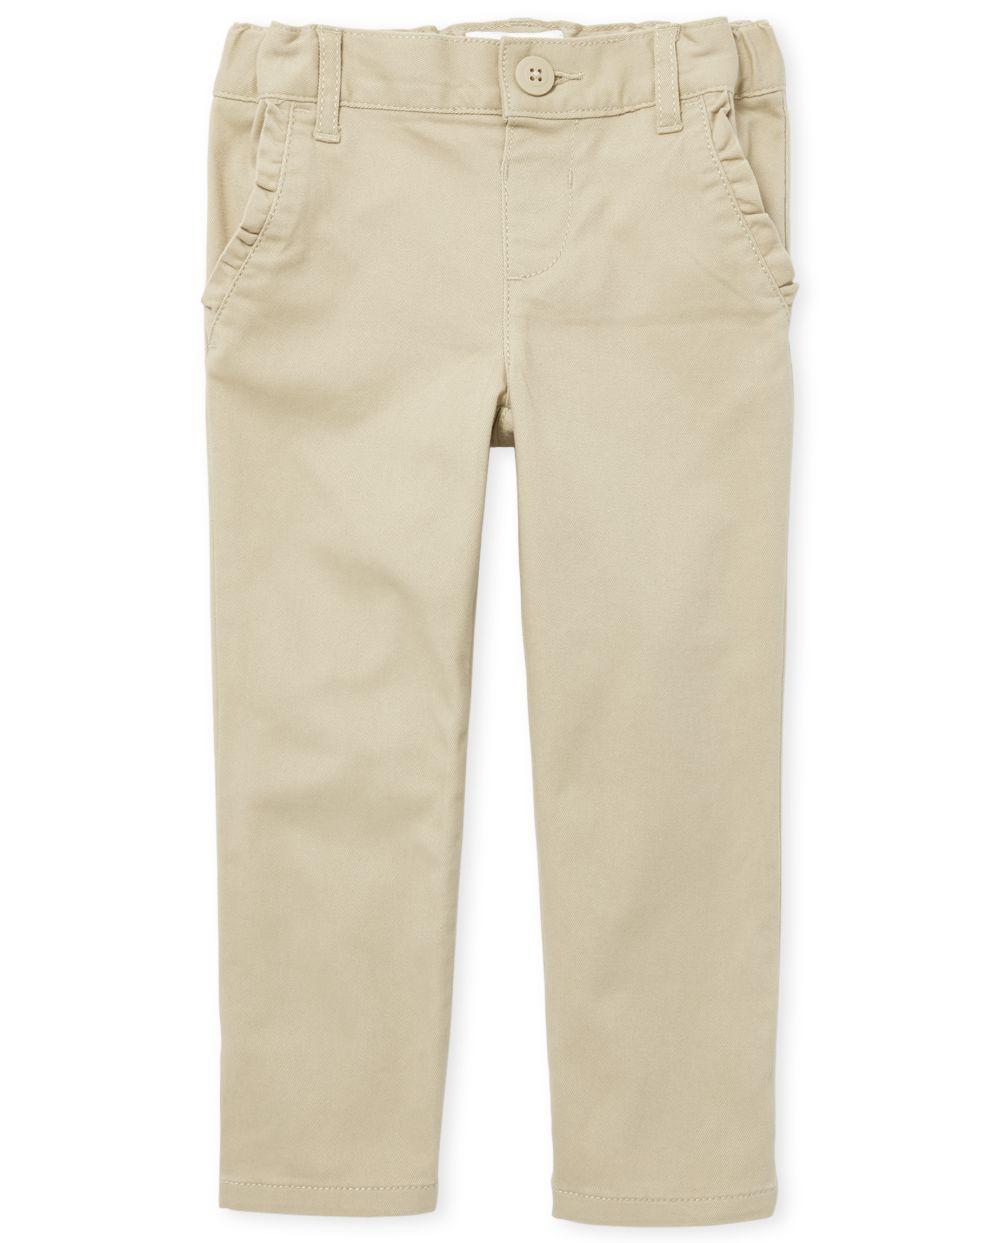 Toddler Girls Uniform Skinny Chino Pants